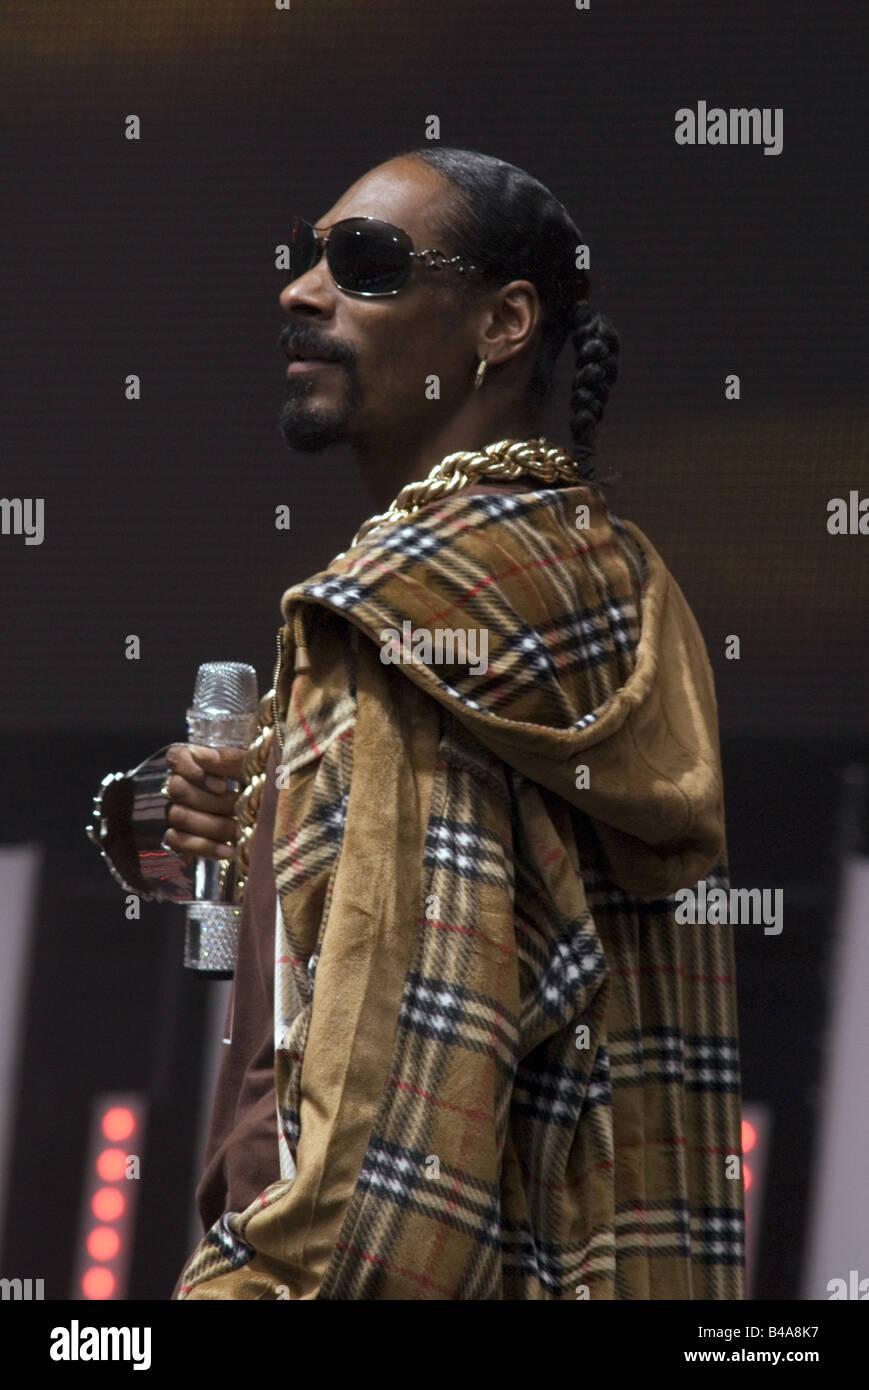 Snoop Dogg, * 20.10.1971, American singer (rap), actor, live performance, Live Earth, half length, Hambug, 7.7.2007, - Stock Image